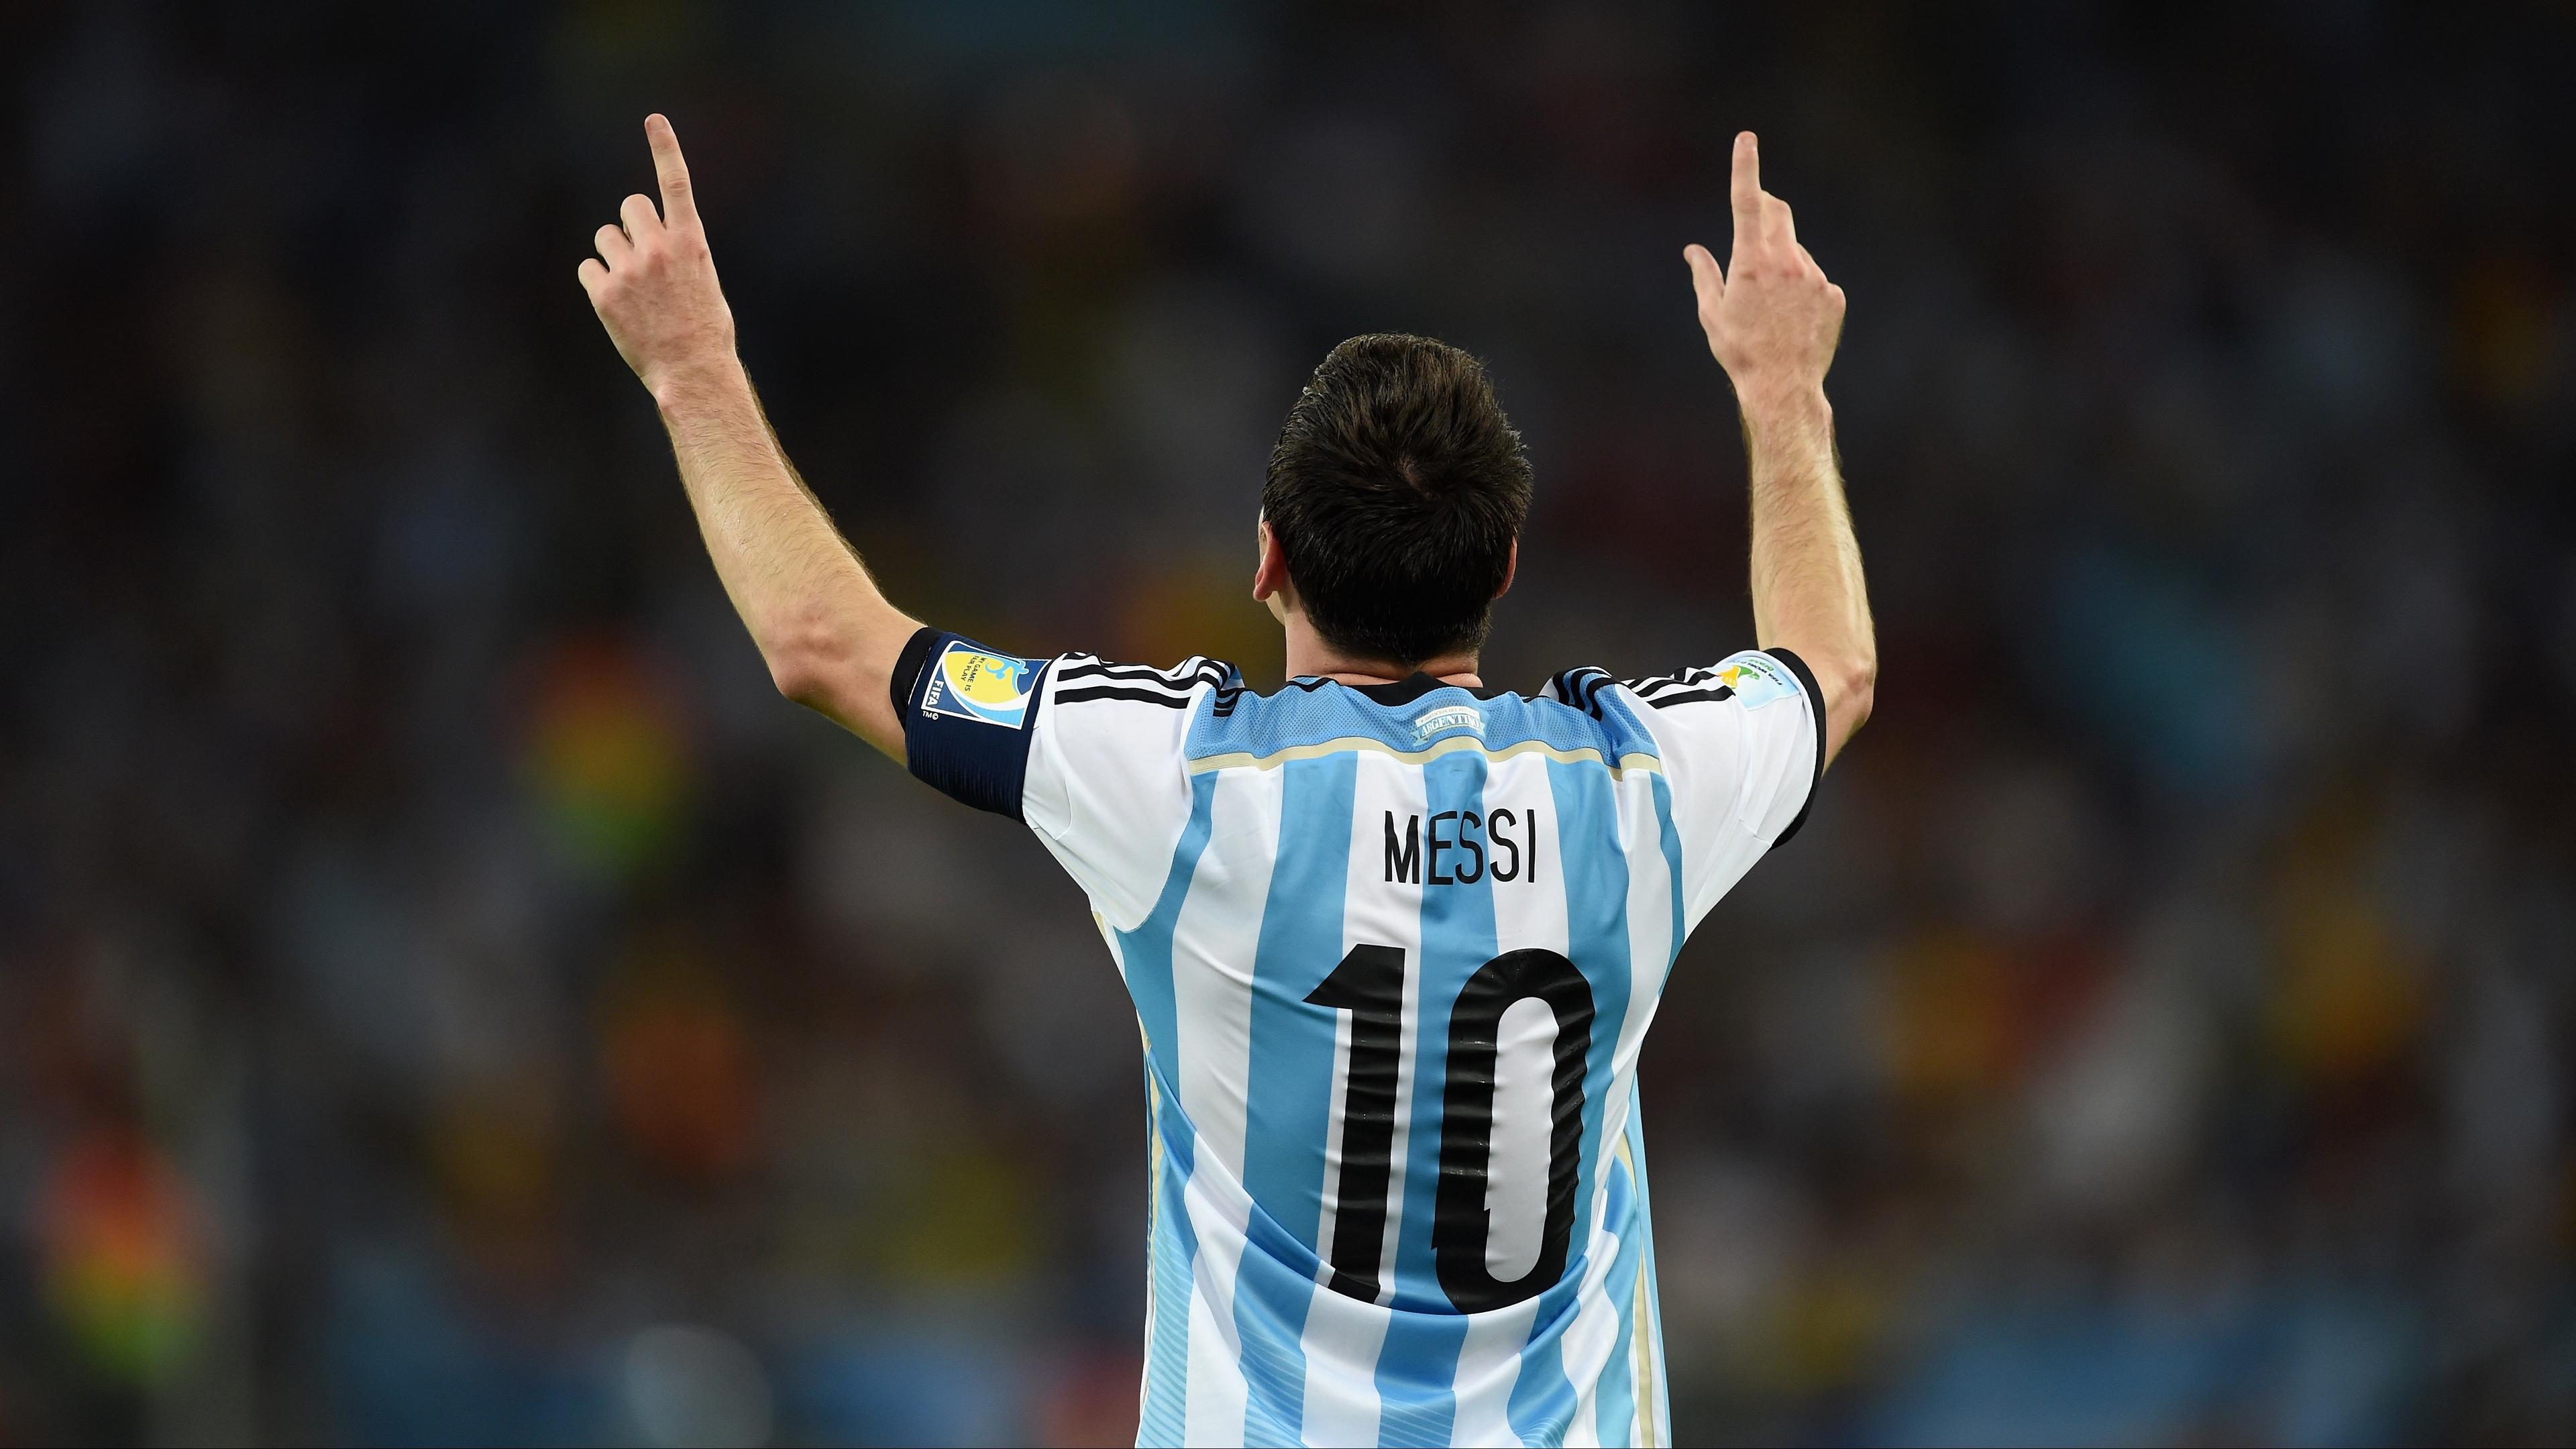 lionel messi barcelona football player 4k 1540063491 - lionel messi, barcelona, football player 4k - lionel messi, football player, Barcelona